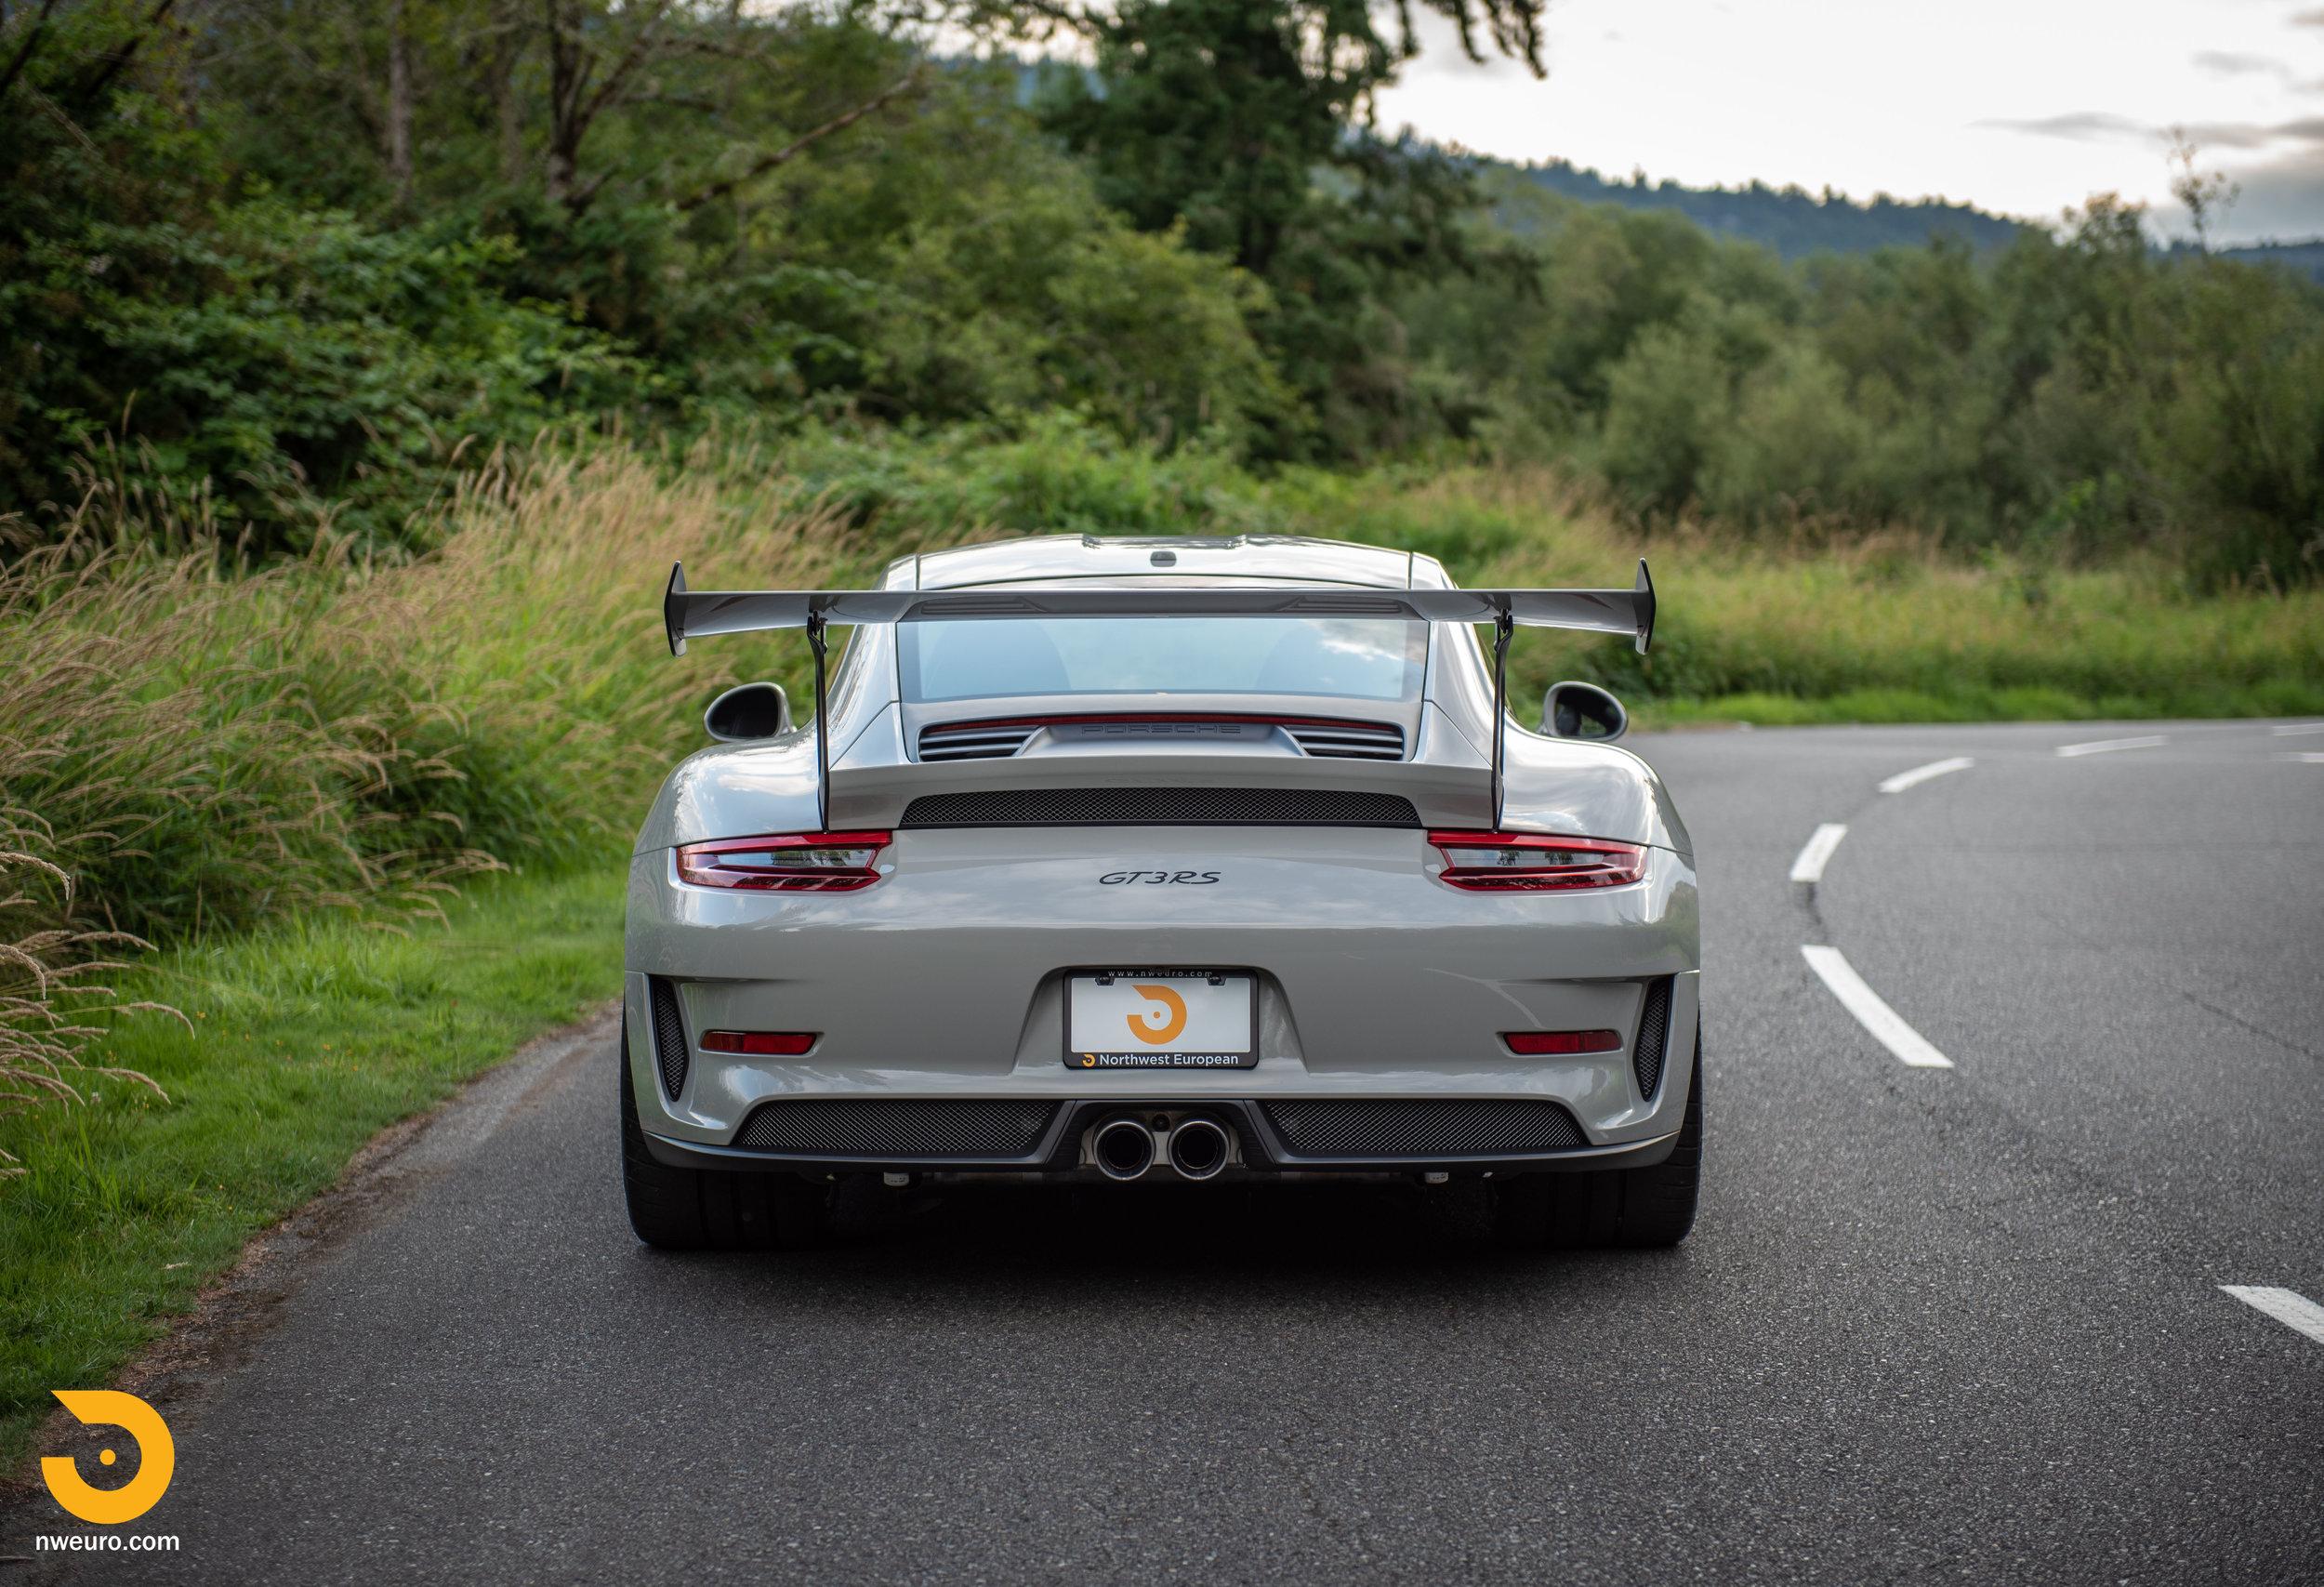 2019 Porsche GT3 RS - Chalk-54.jpg